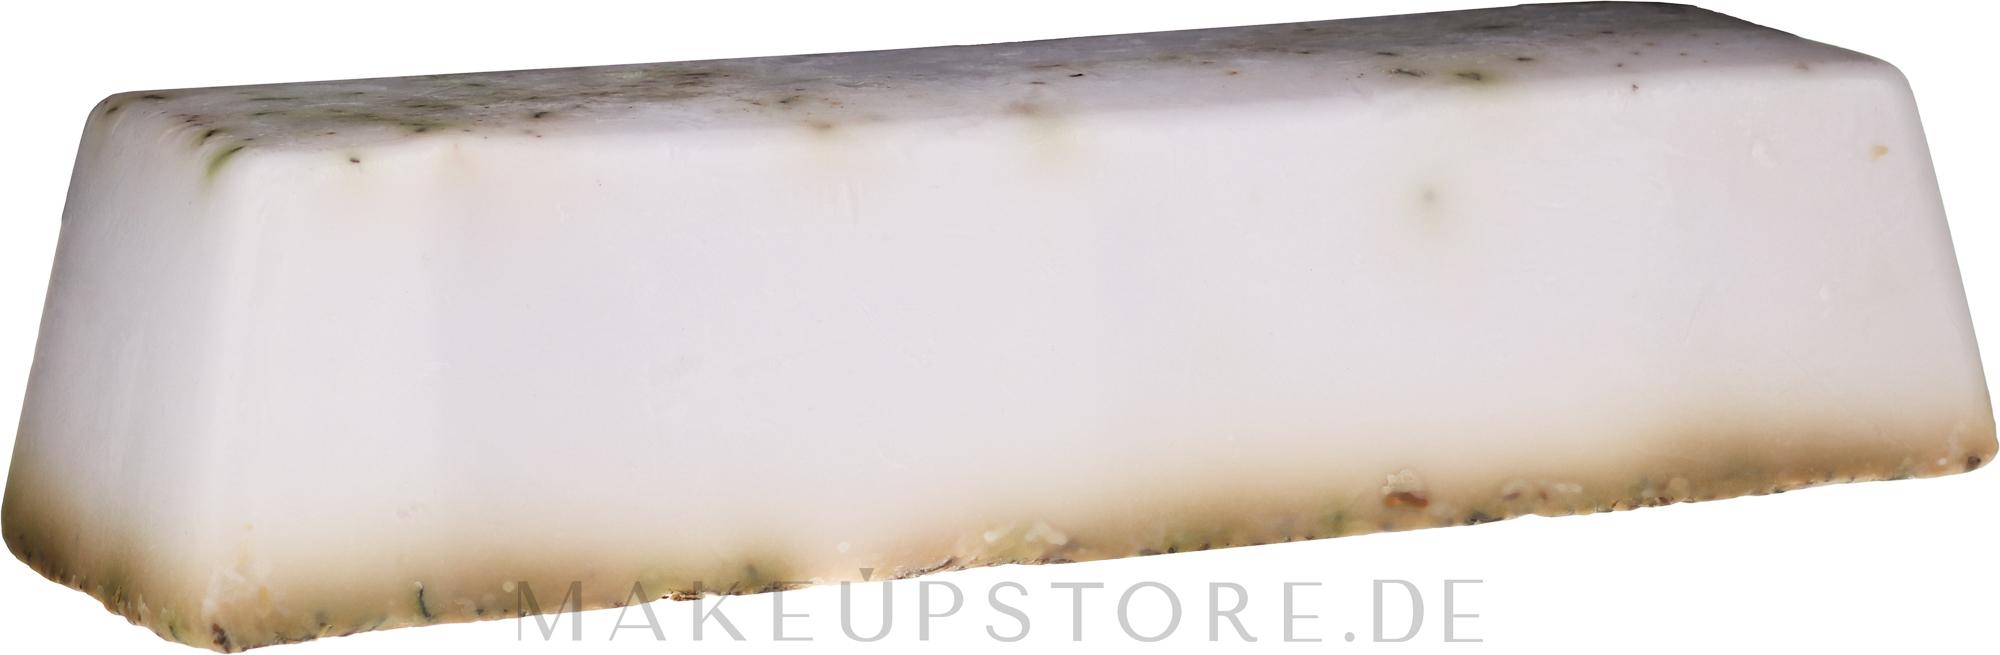 Handgemachte Naturseife mit Glycerin und Lavendel aus der Provence - E-Fiore Natural Soap Lavender From Provence — Bild 1300 g